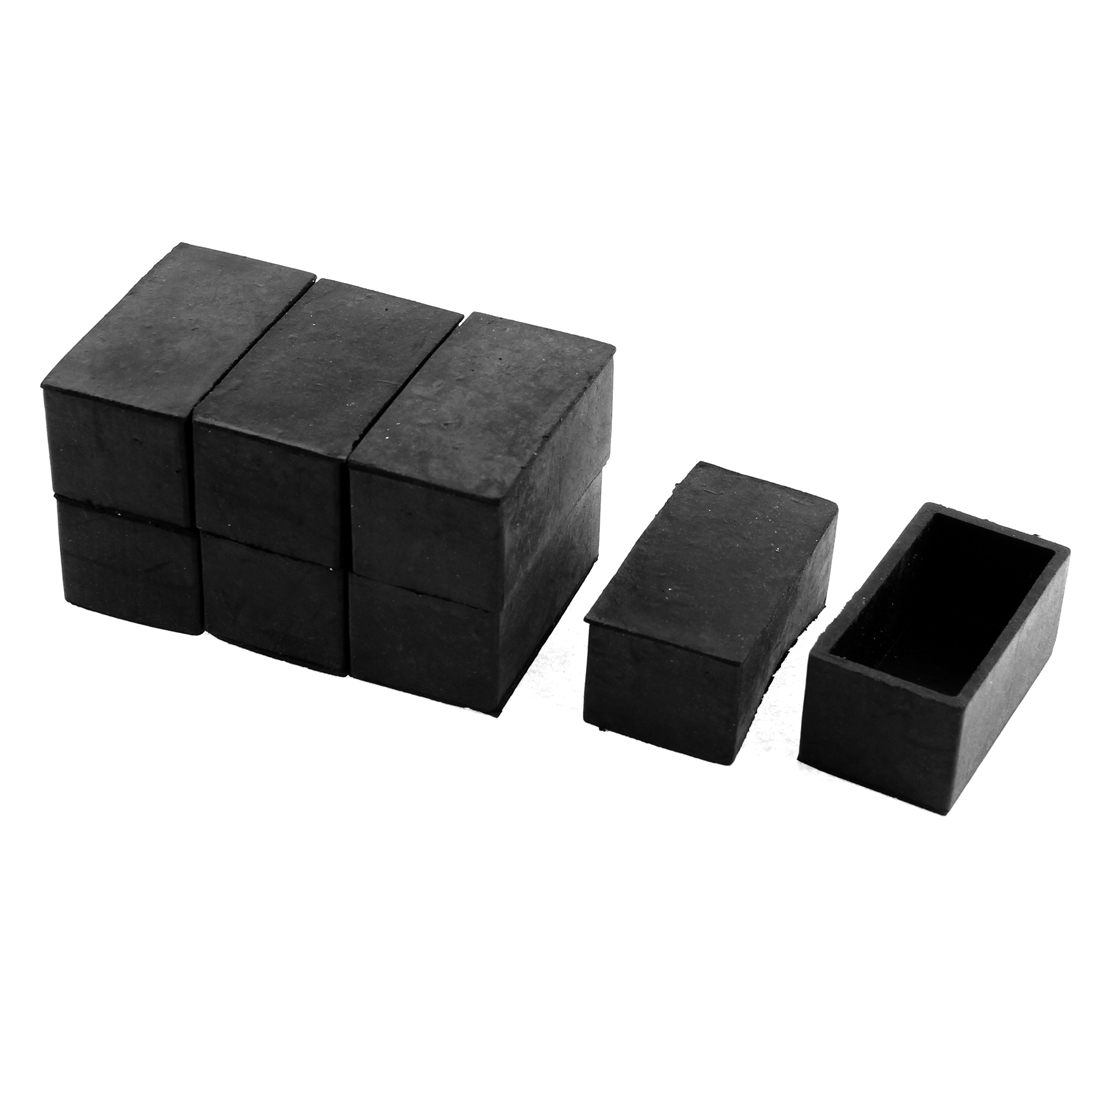 50mmx25mm Furniture Chair Leg Feet Floor Rubber Protectors Ferrules Black 8pcs